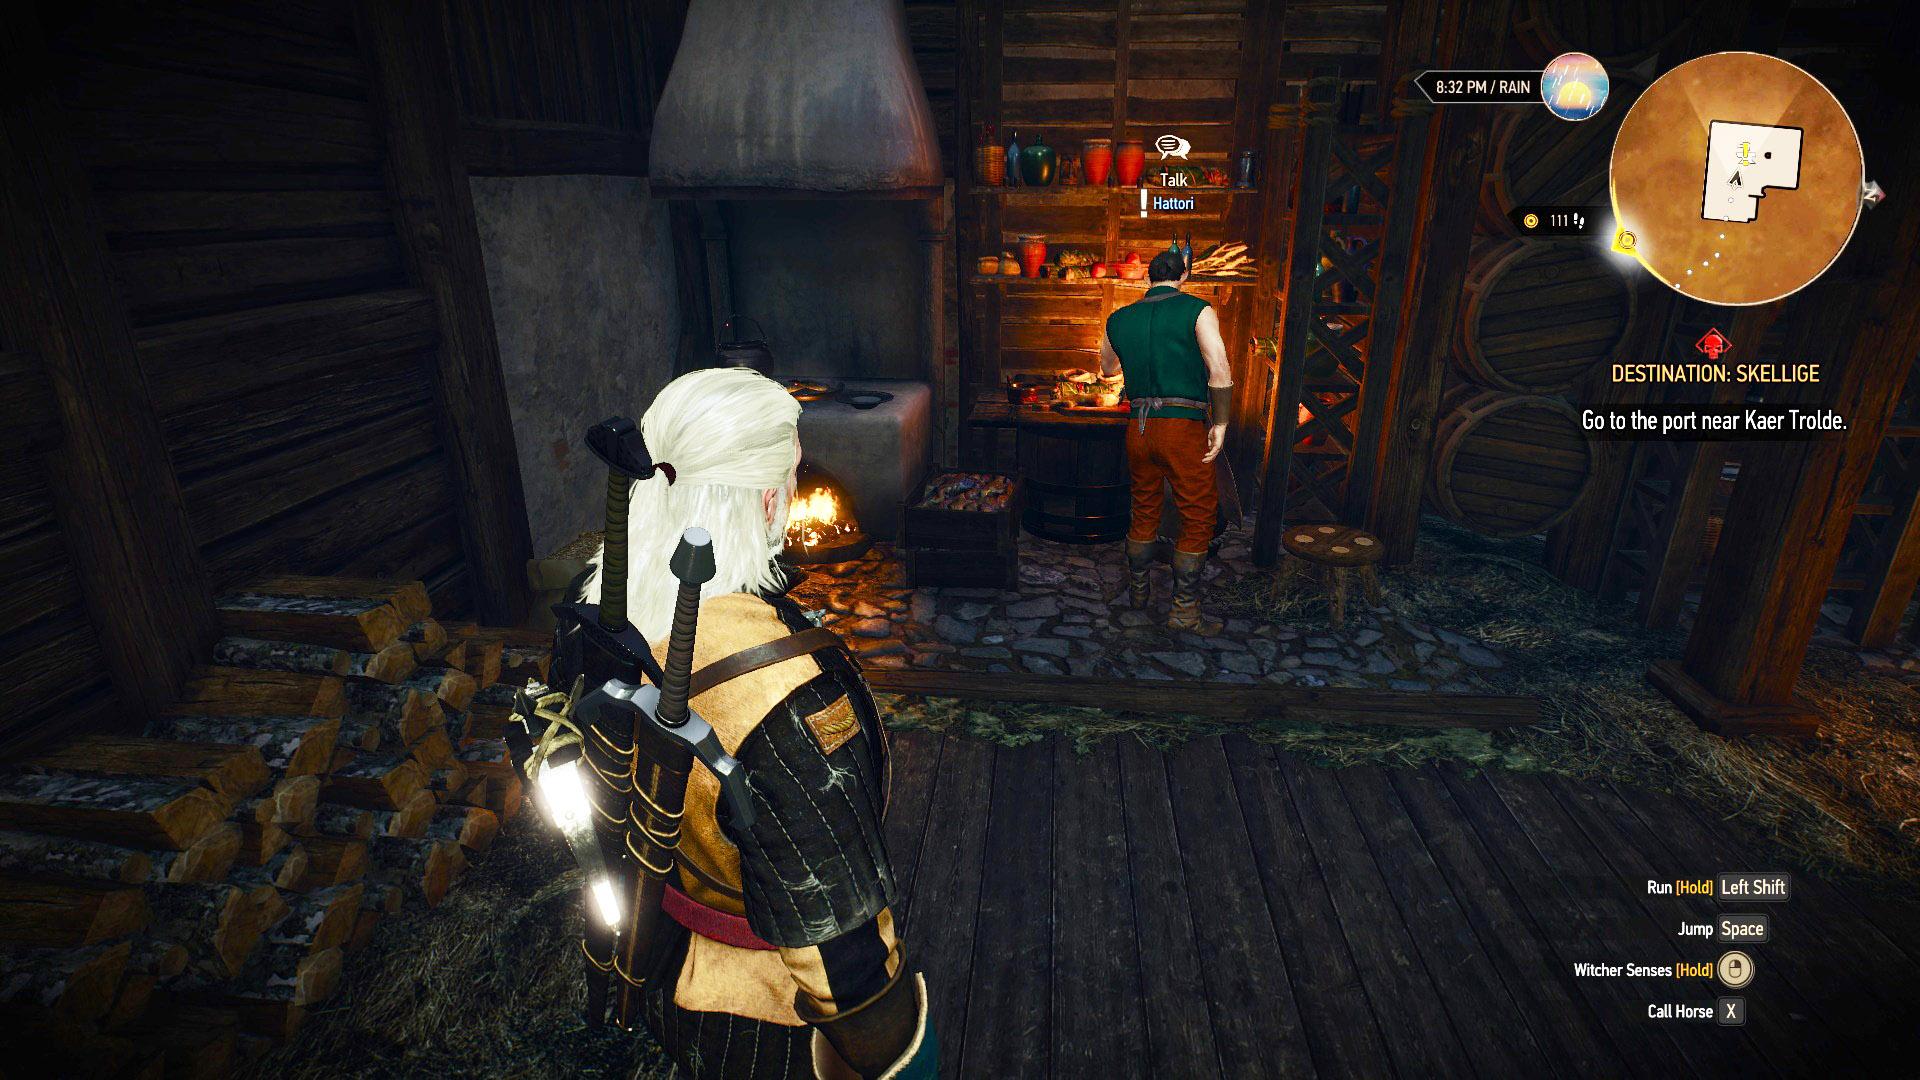 Swords And Dumpling The Witcher 3 Walkthrough